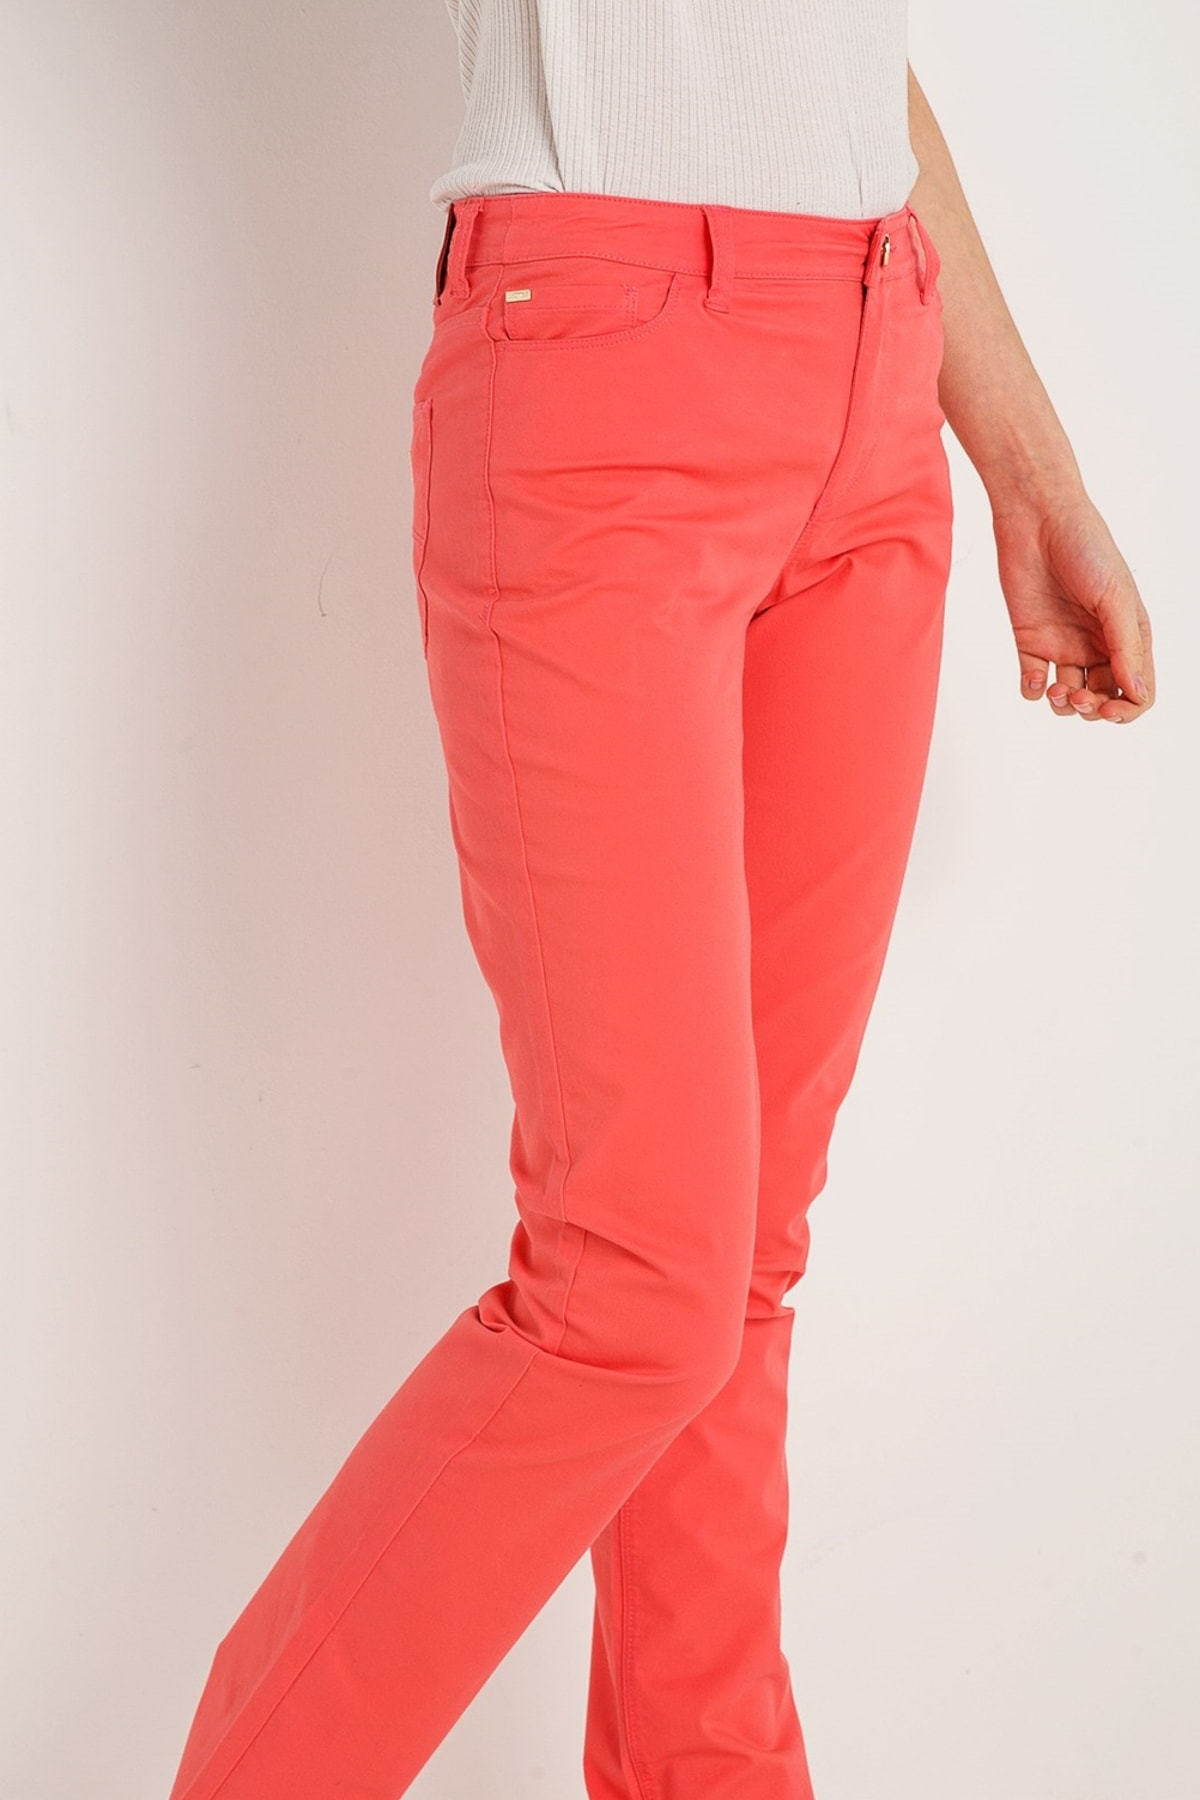 Armani Jeans Armanı Jeans Kot Pantolon 2